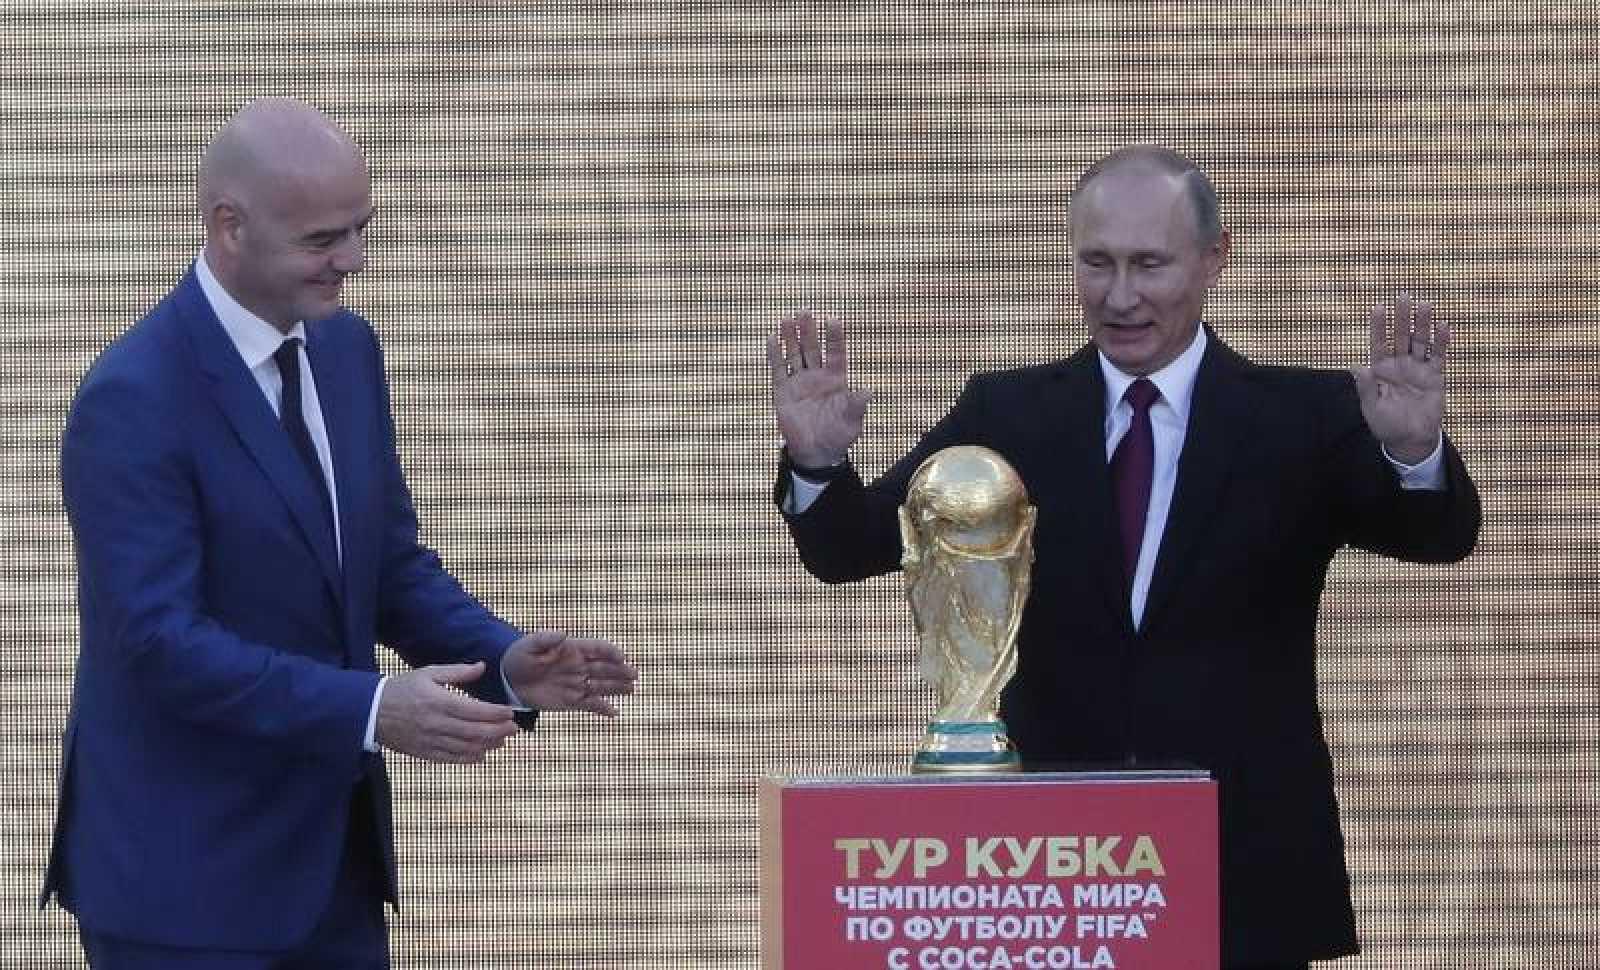 El presidente de la FIFA, Gianni Infantino, y el presidente de Rusia, Vladimir Putin.